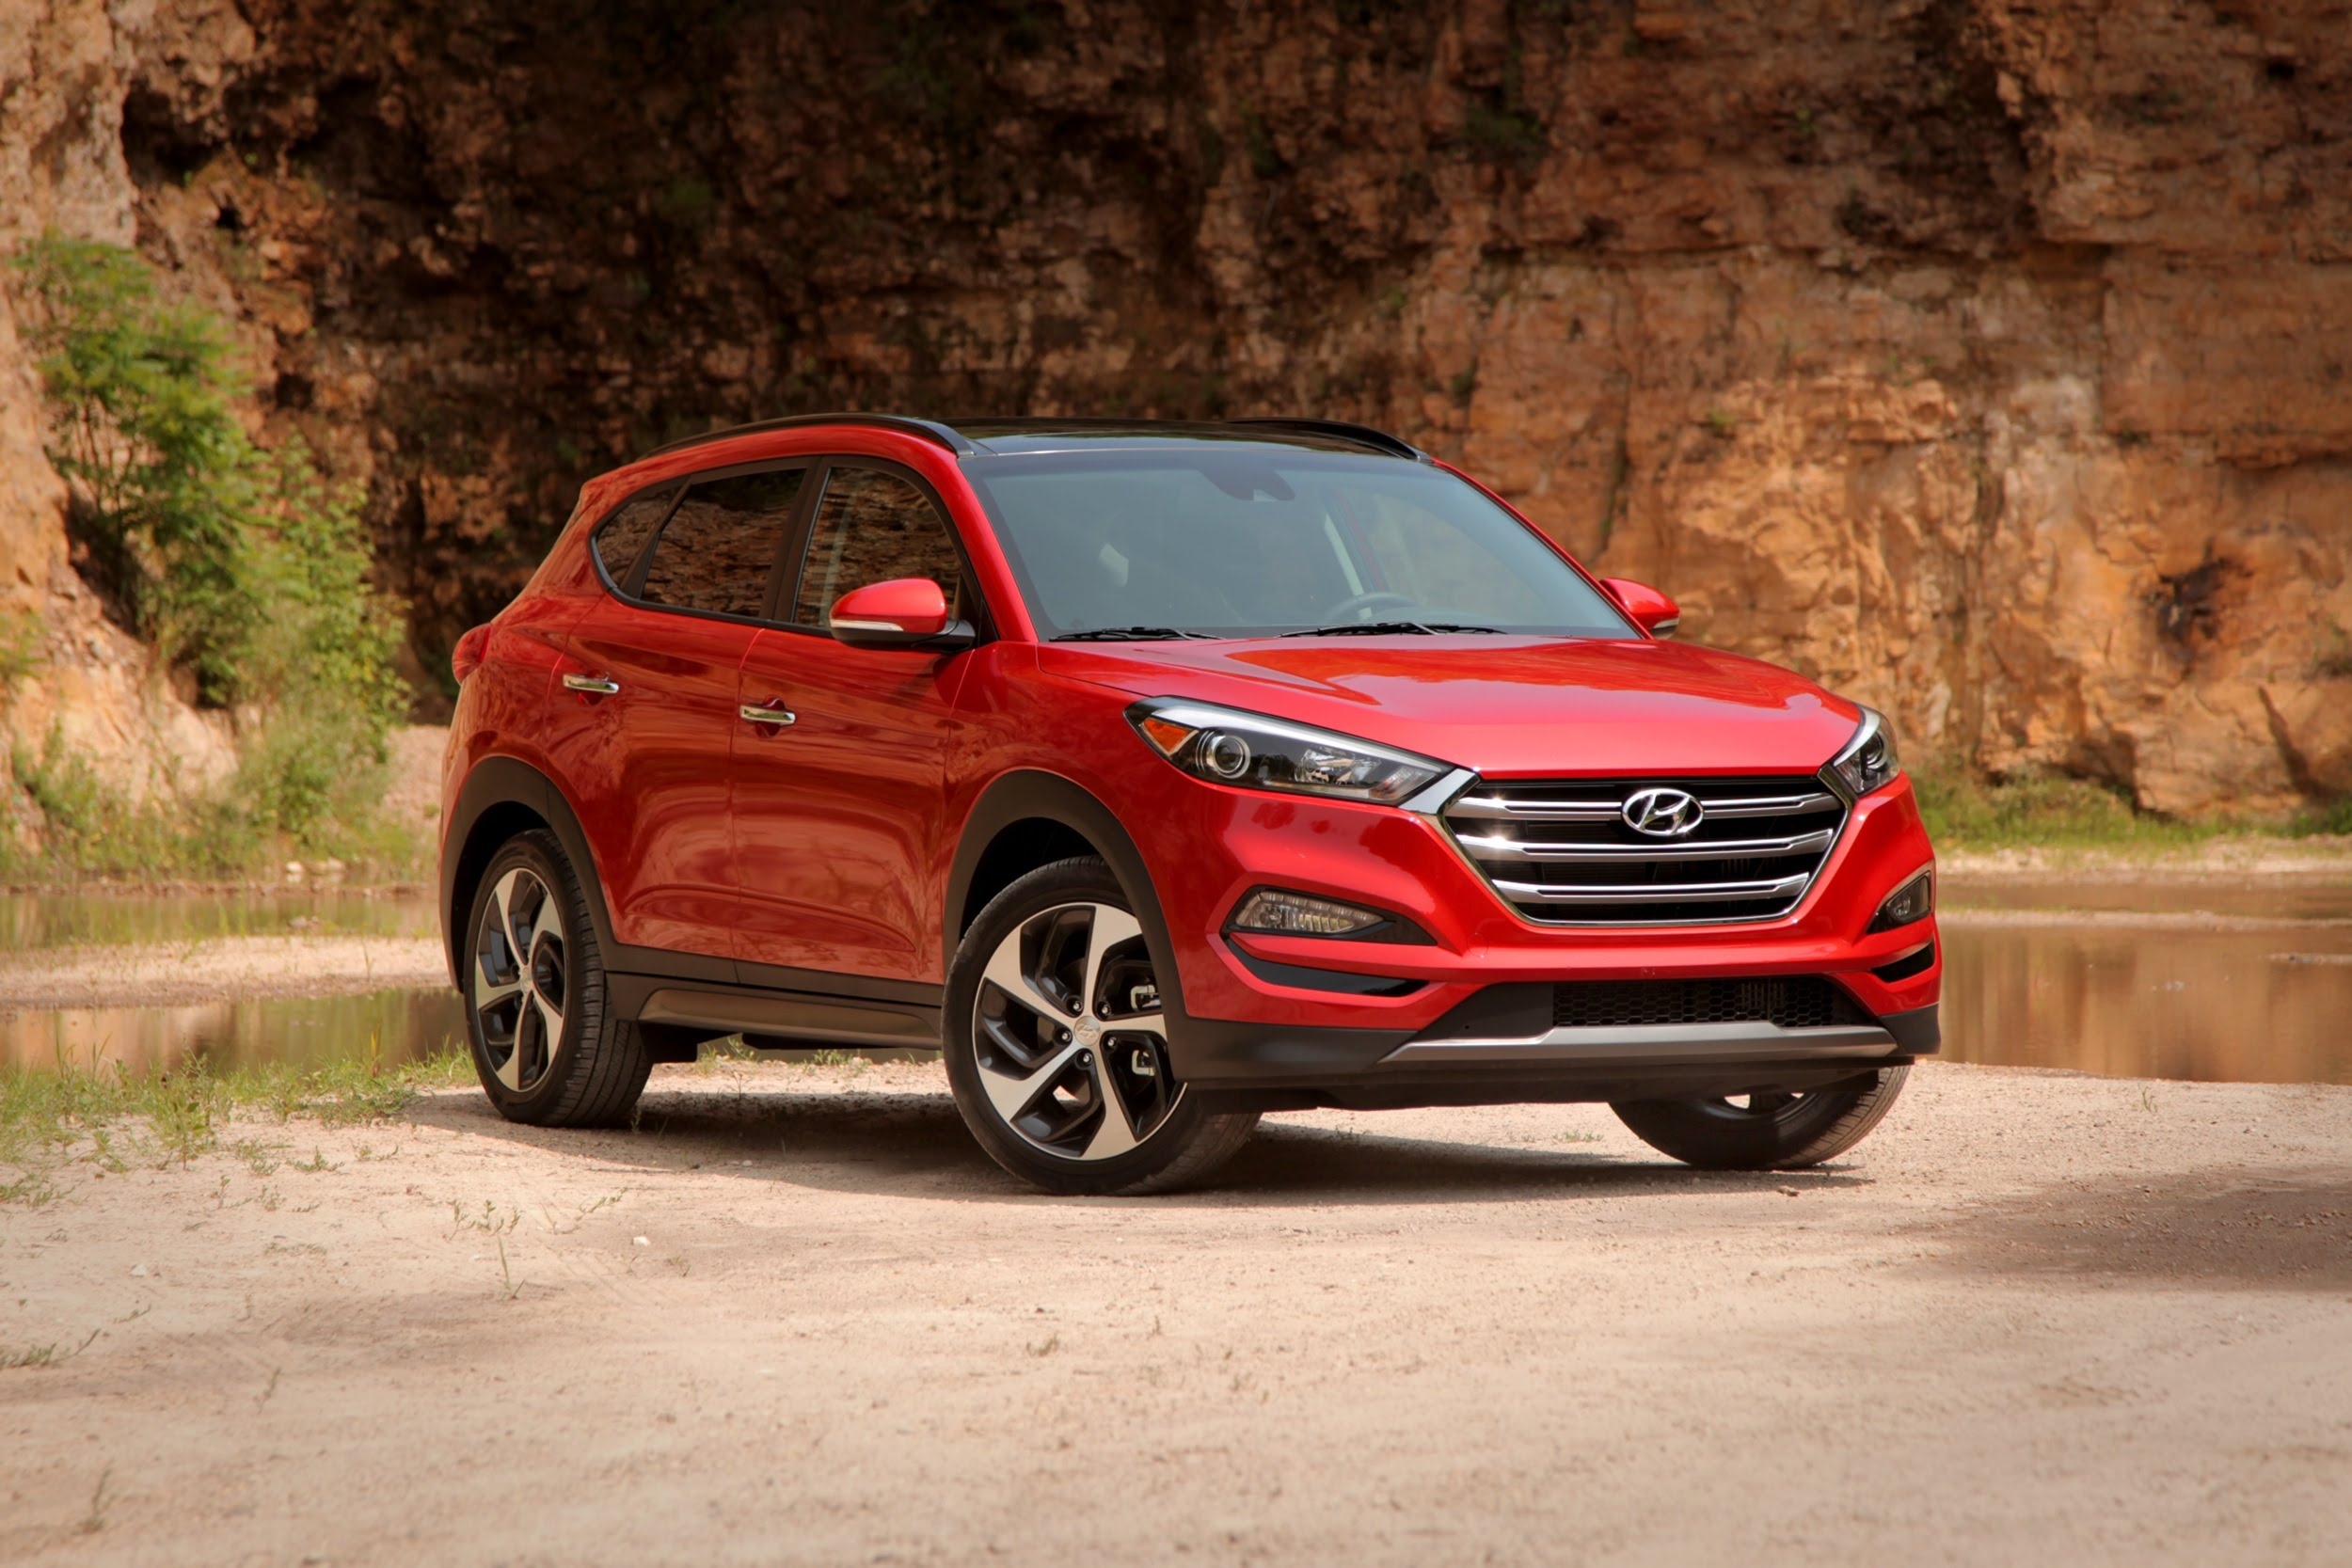 early group tucson rebates hyundai new listings leasing auto sales